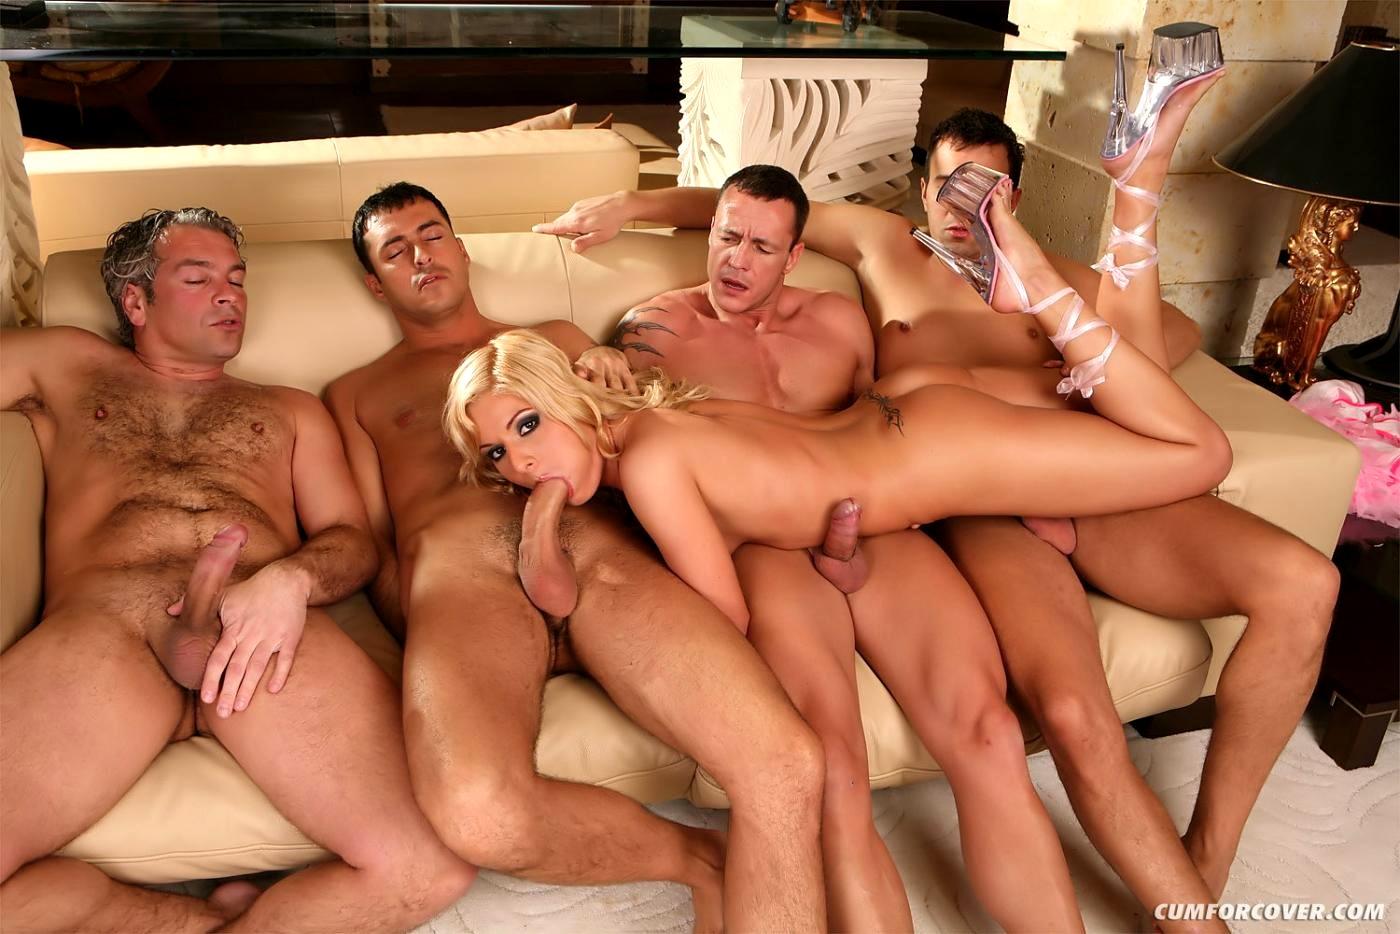 skachat-luchshee-porno-gruppovoe